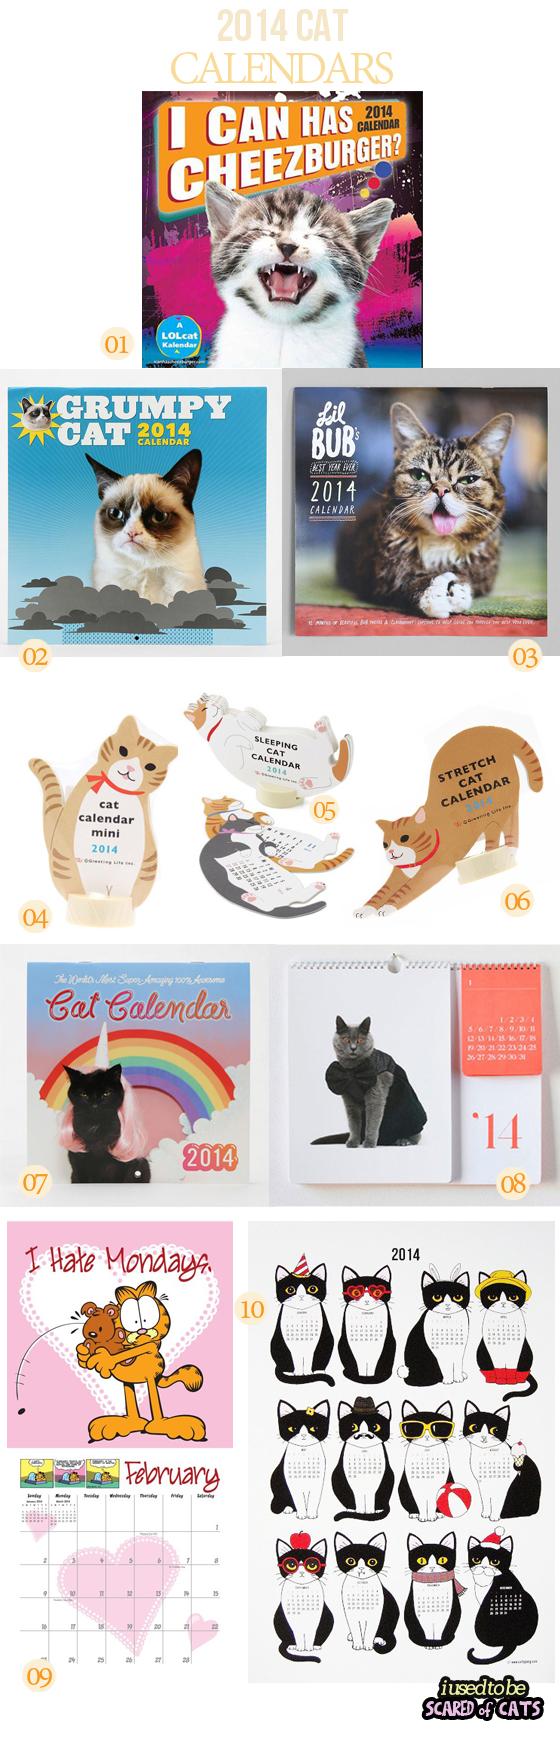 top 10 Cat Calendars 2014